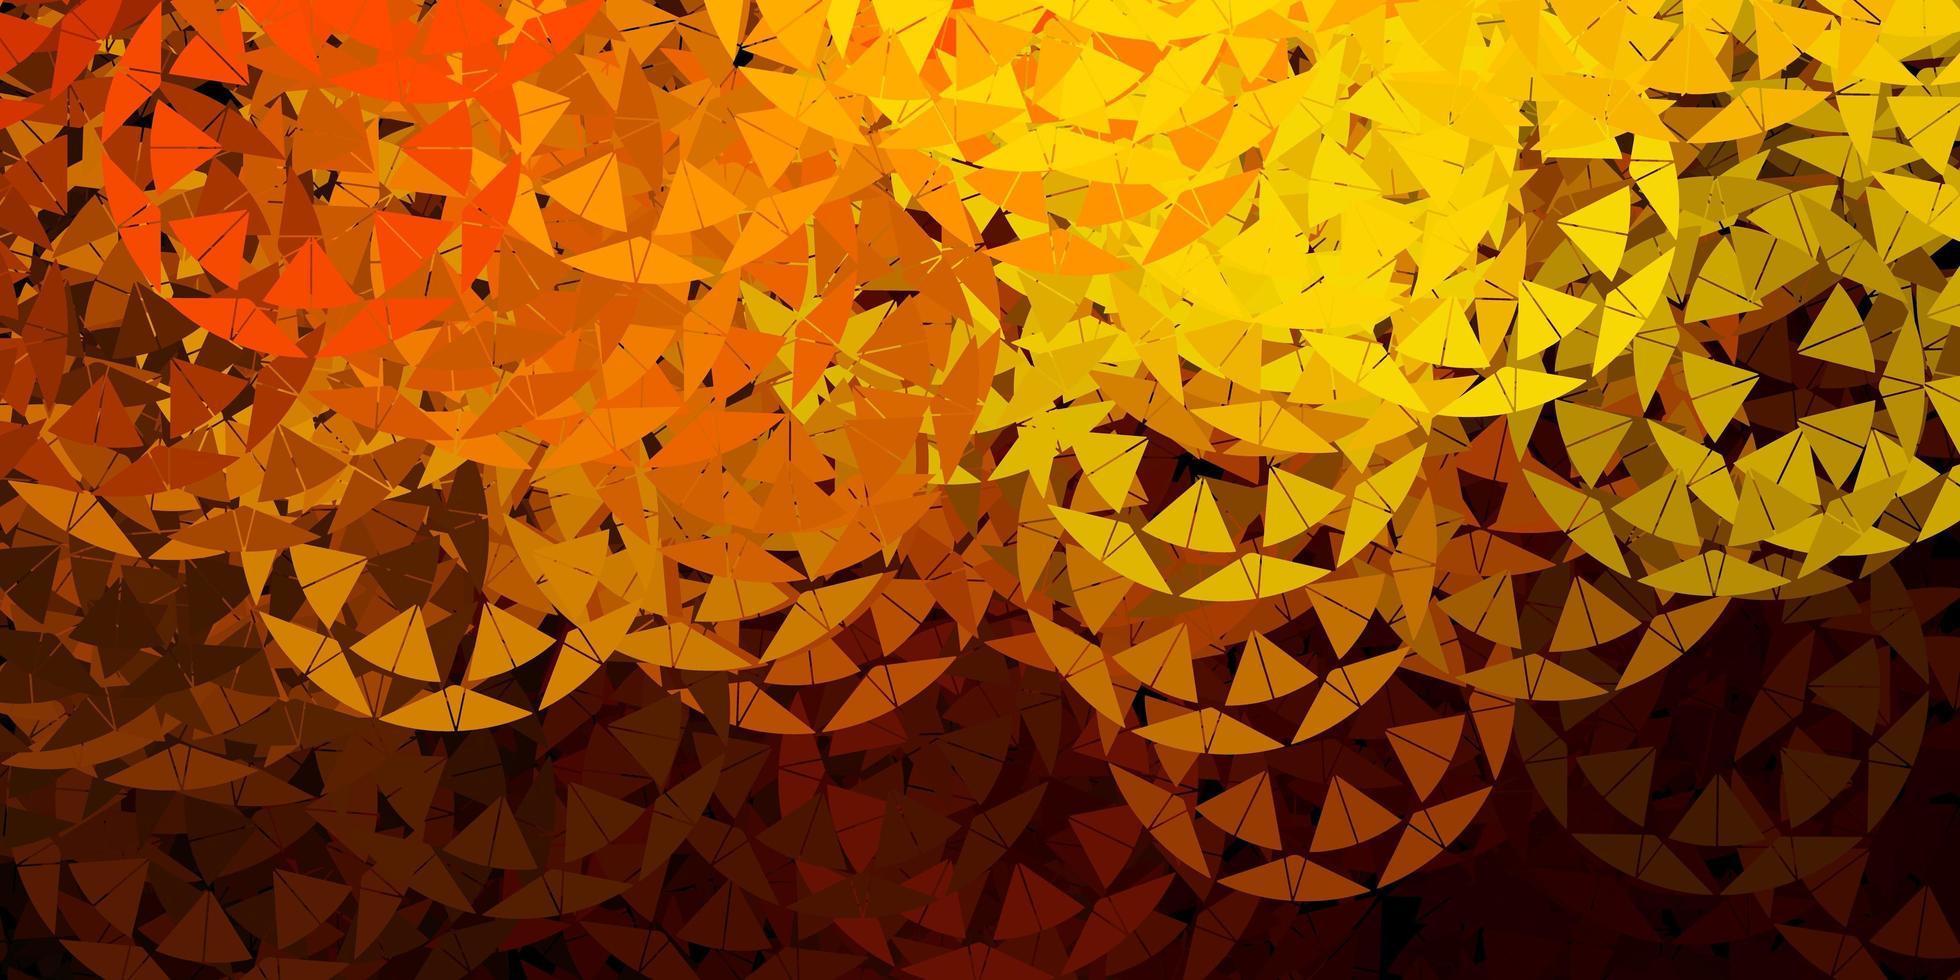 fundo vector verde-escuro amarelo com formas poligonais